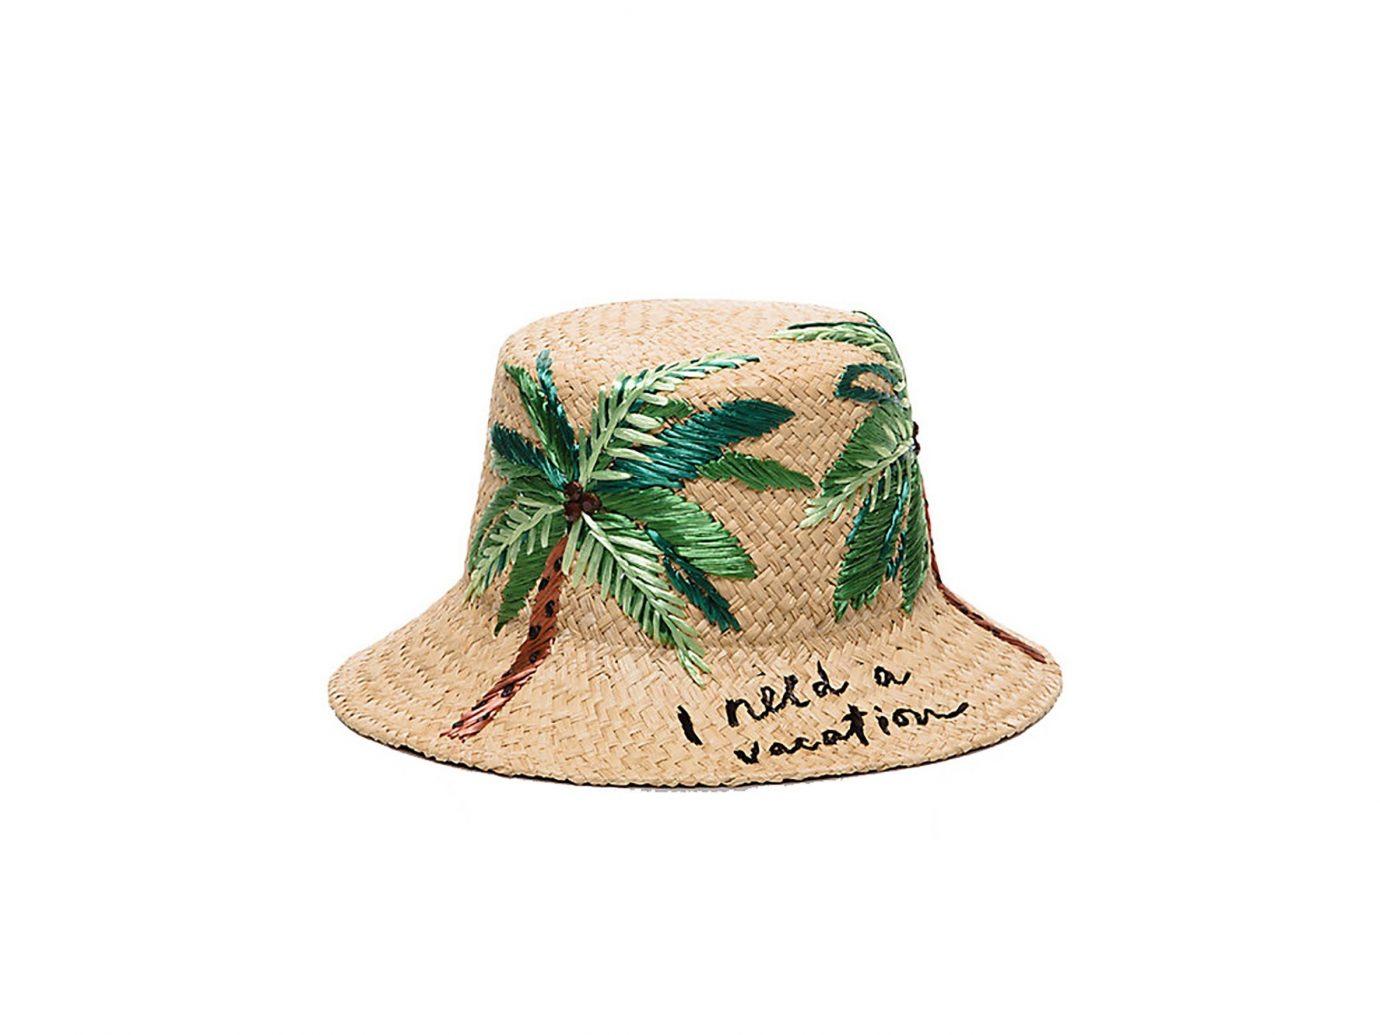 1302dda77e6 Style + Design footwear clothing hat shoe cap fashion accessory outdoor shoe